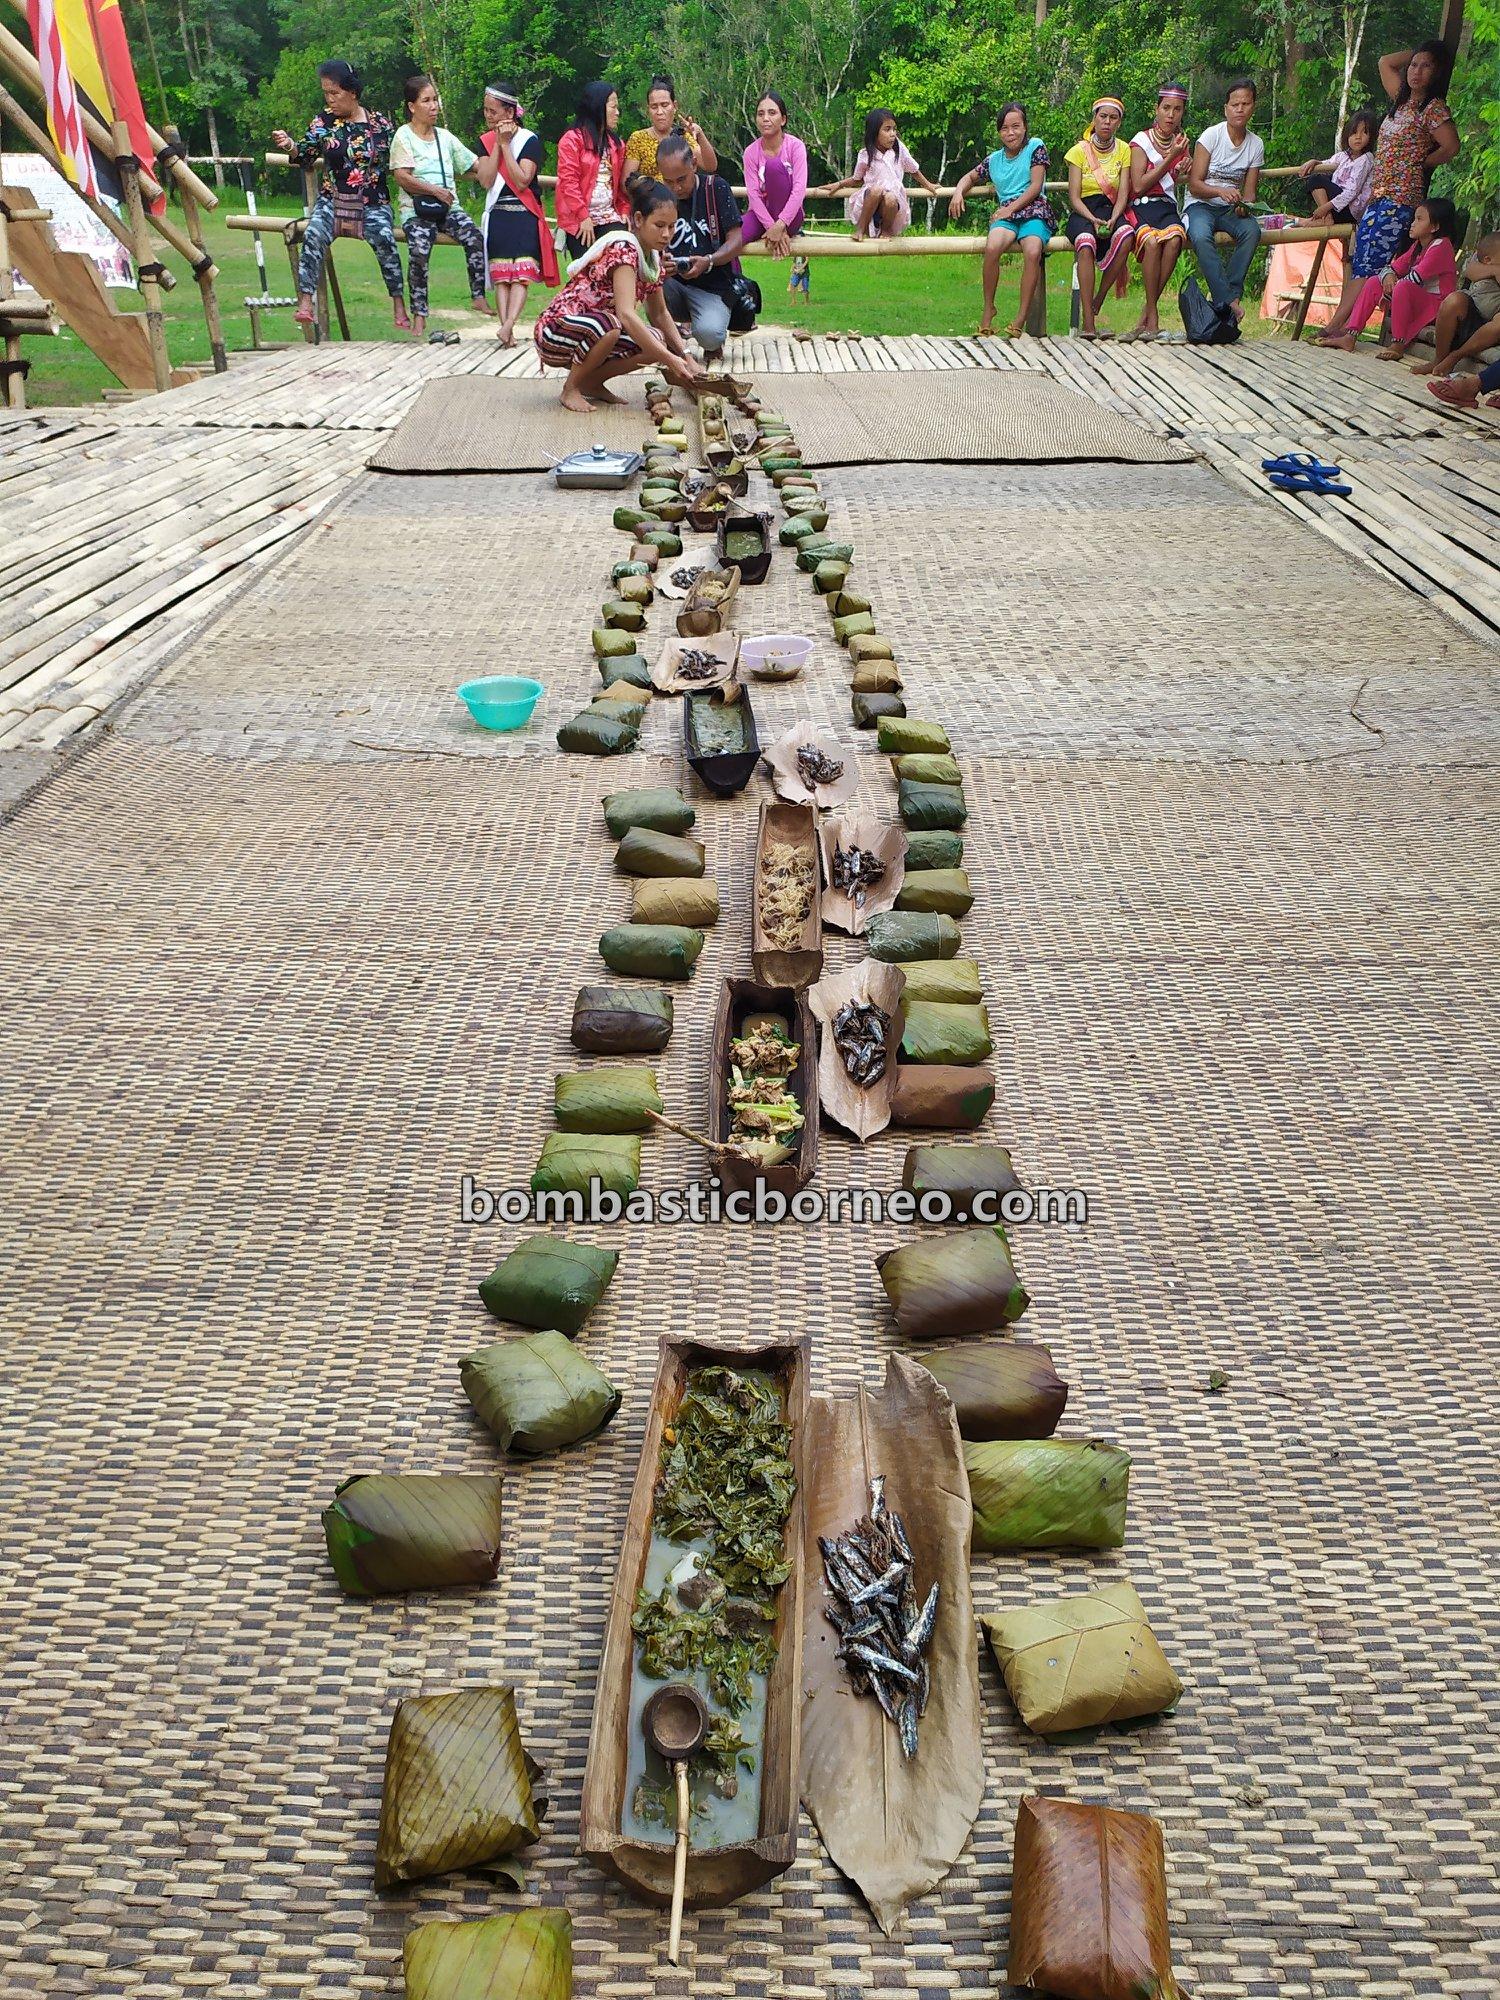 Gawai Nyabakng, harvest festival, Sungkung Medeng, traditional, budaya, culture, Bengkayang, Indonesia, Kalimantan Barat, highland, village, Tourism, tourist attraction, travel guide, Borneo